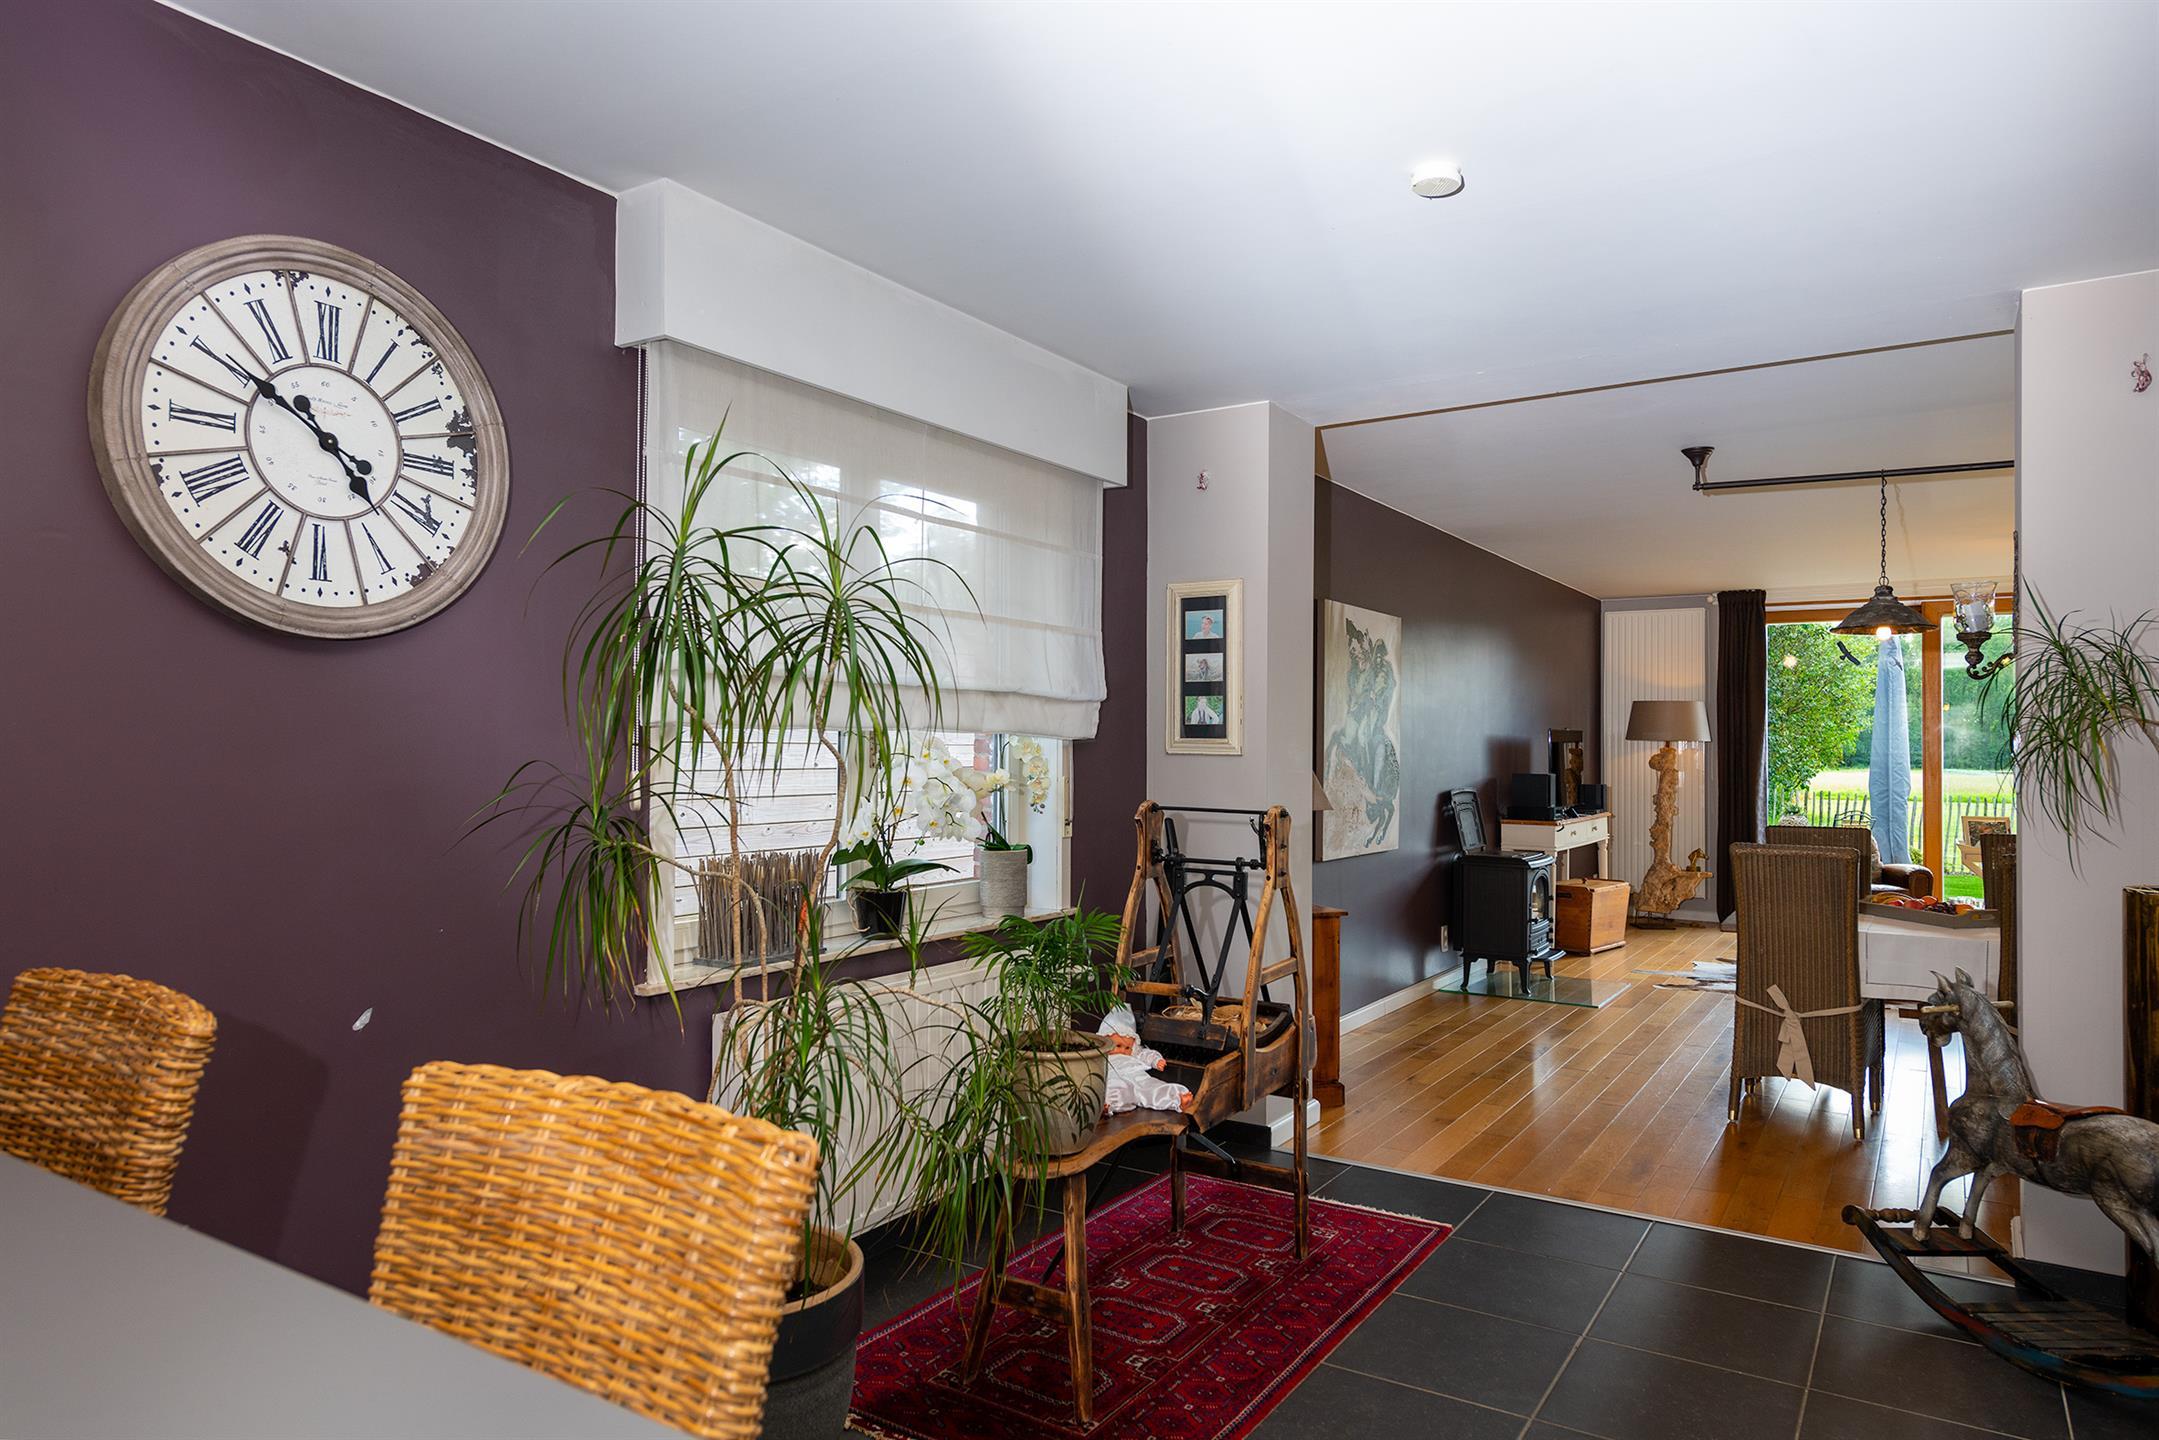 Charmant huis - Sint-Katelijne-Waver - #4492892-7